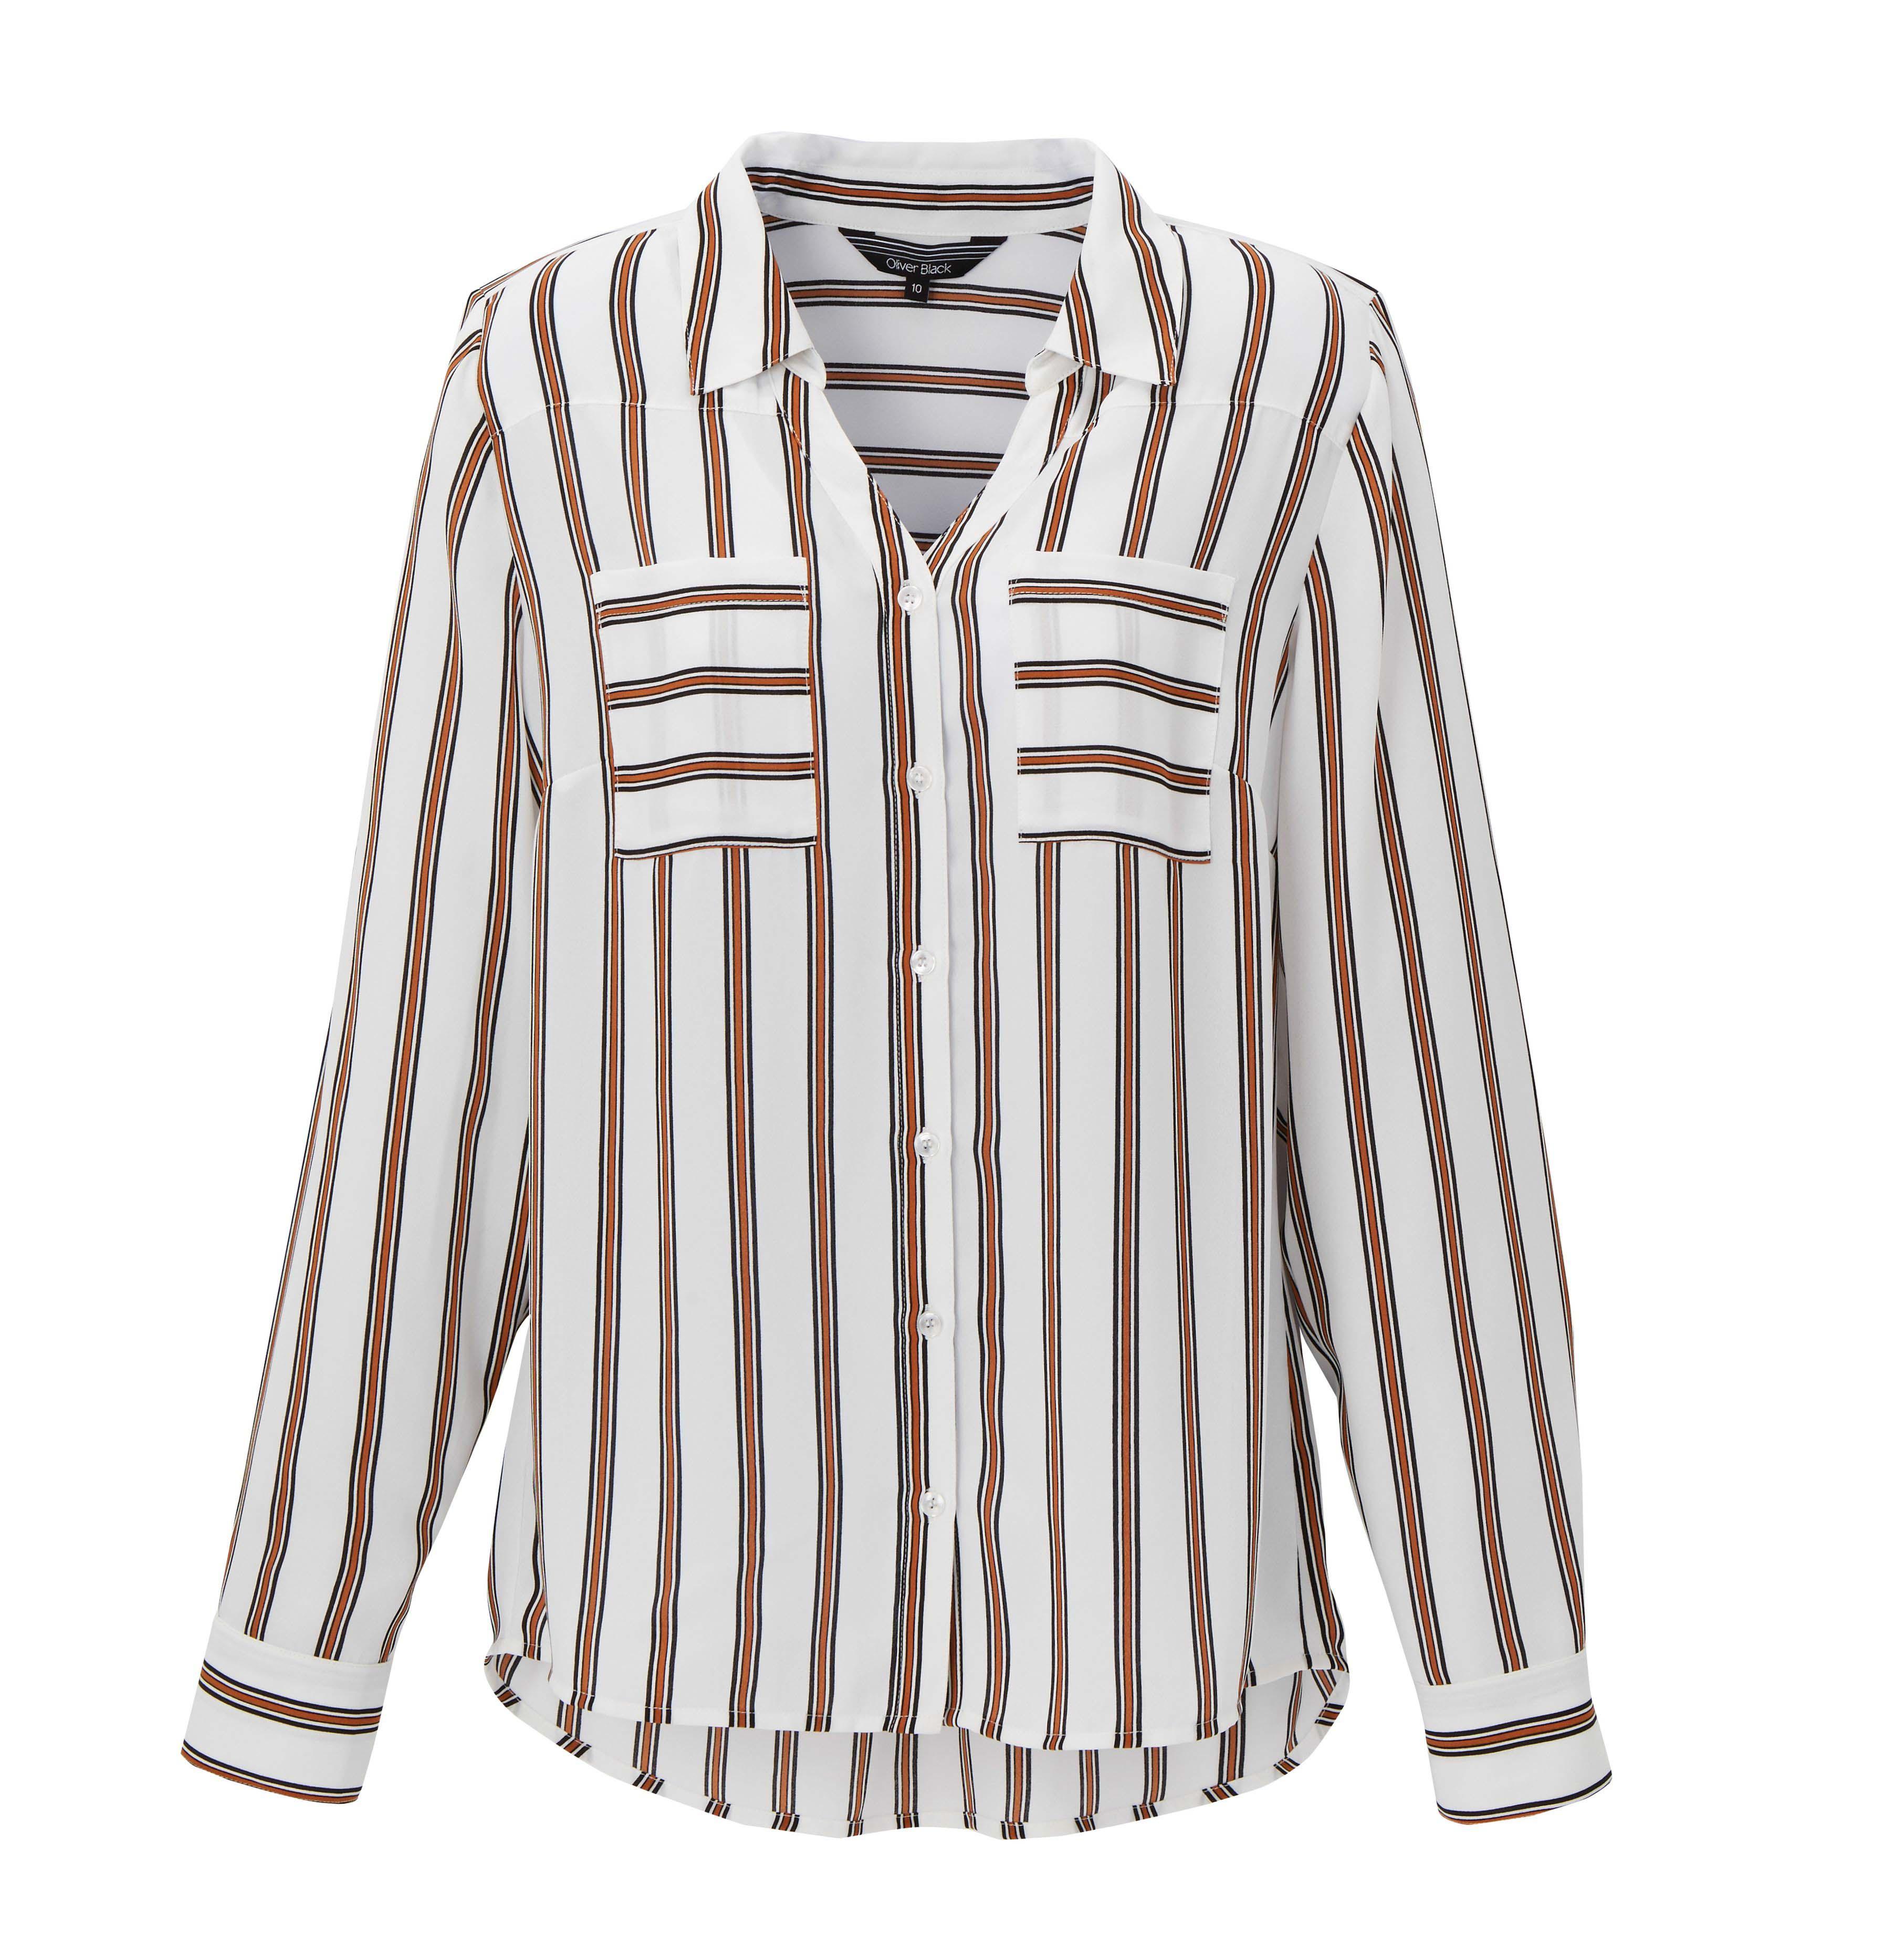 6077846 Oliver Black OB Stripe Black White Shirt $69.99 Instore 4 Feb 2016